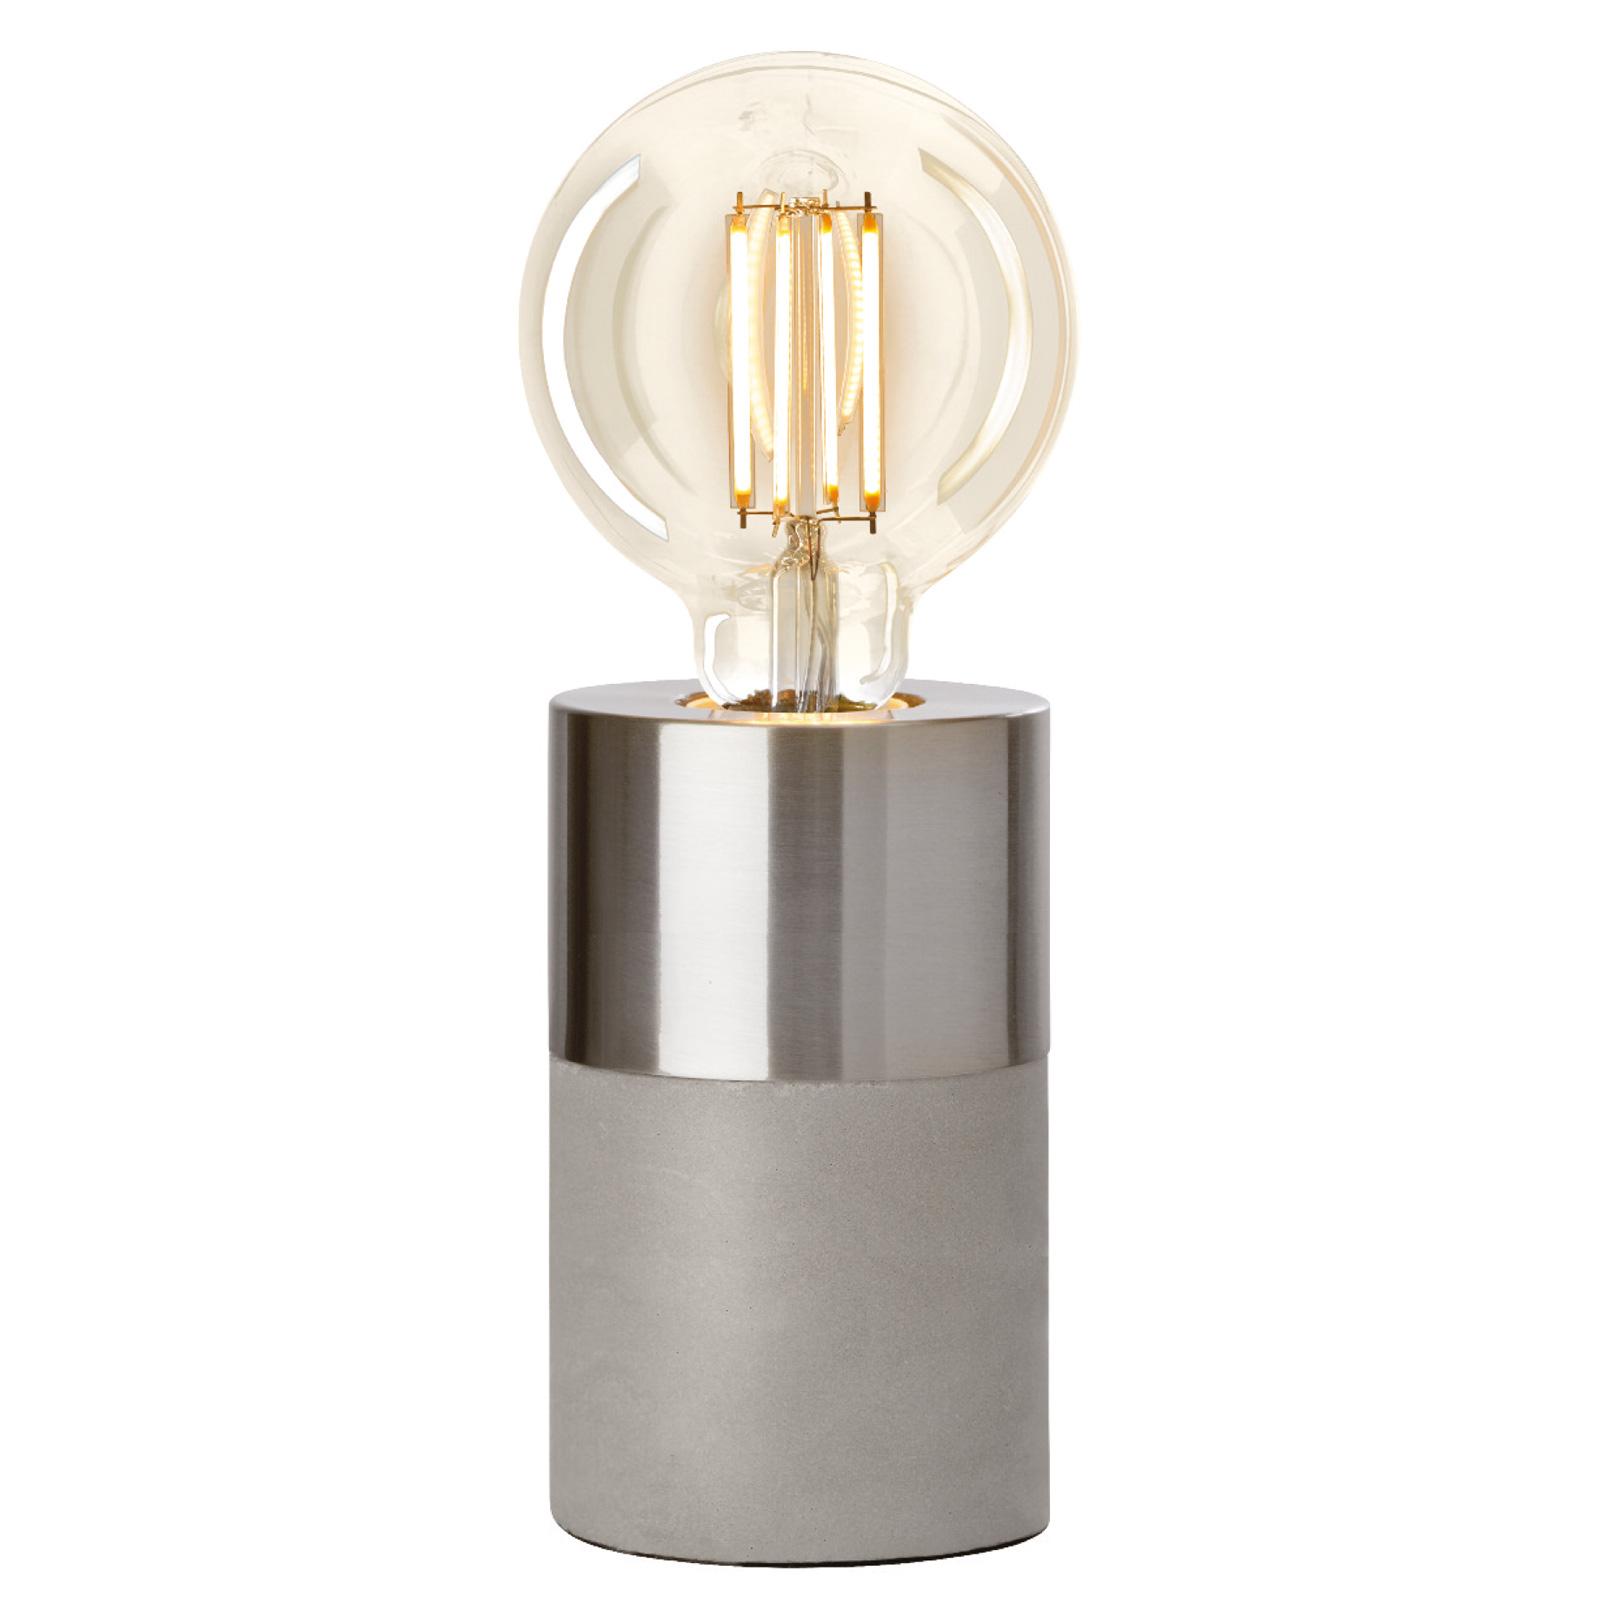 Acquista Villeroy & Boch Athen lampada da tavolo cromata